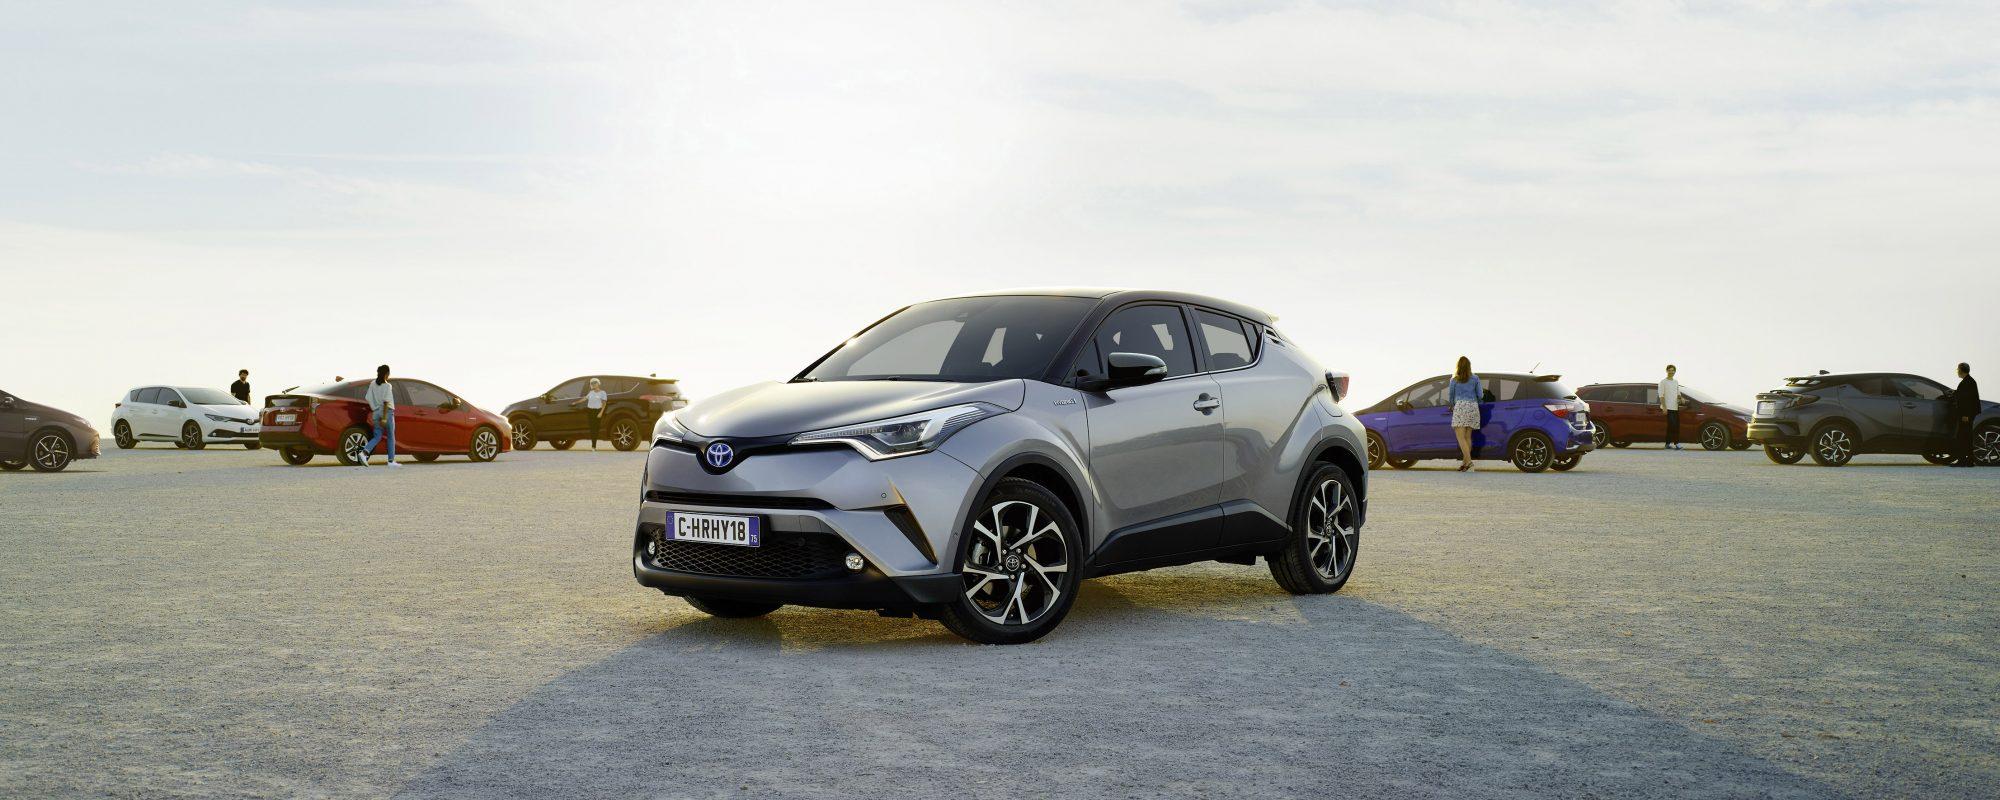 Toyota levert 2 miljoenste hybride in Europa